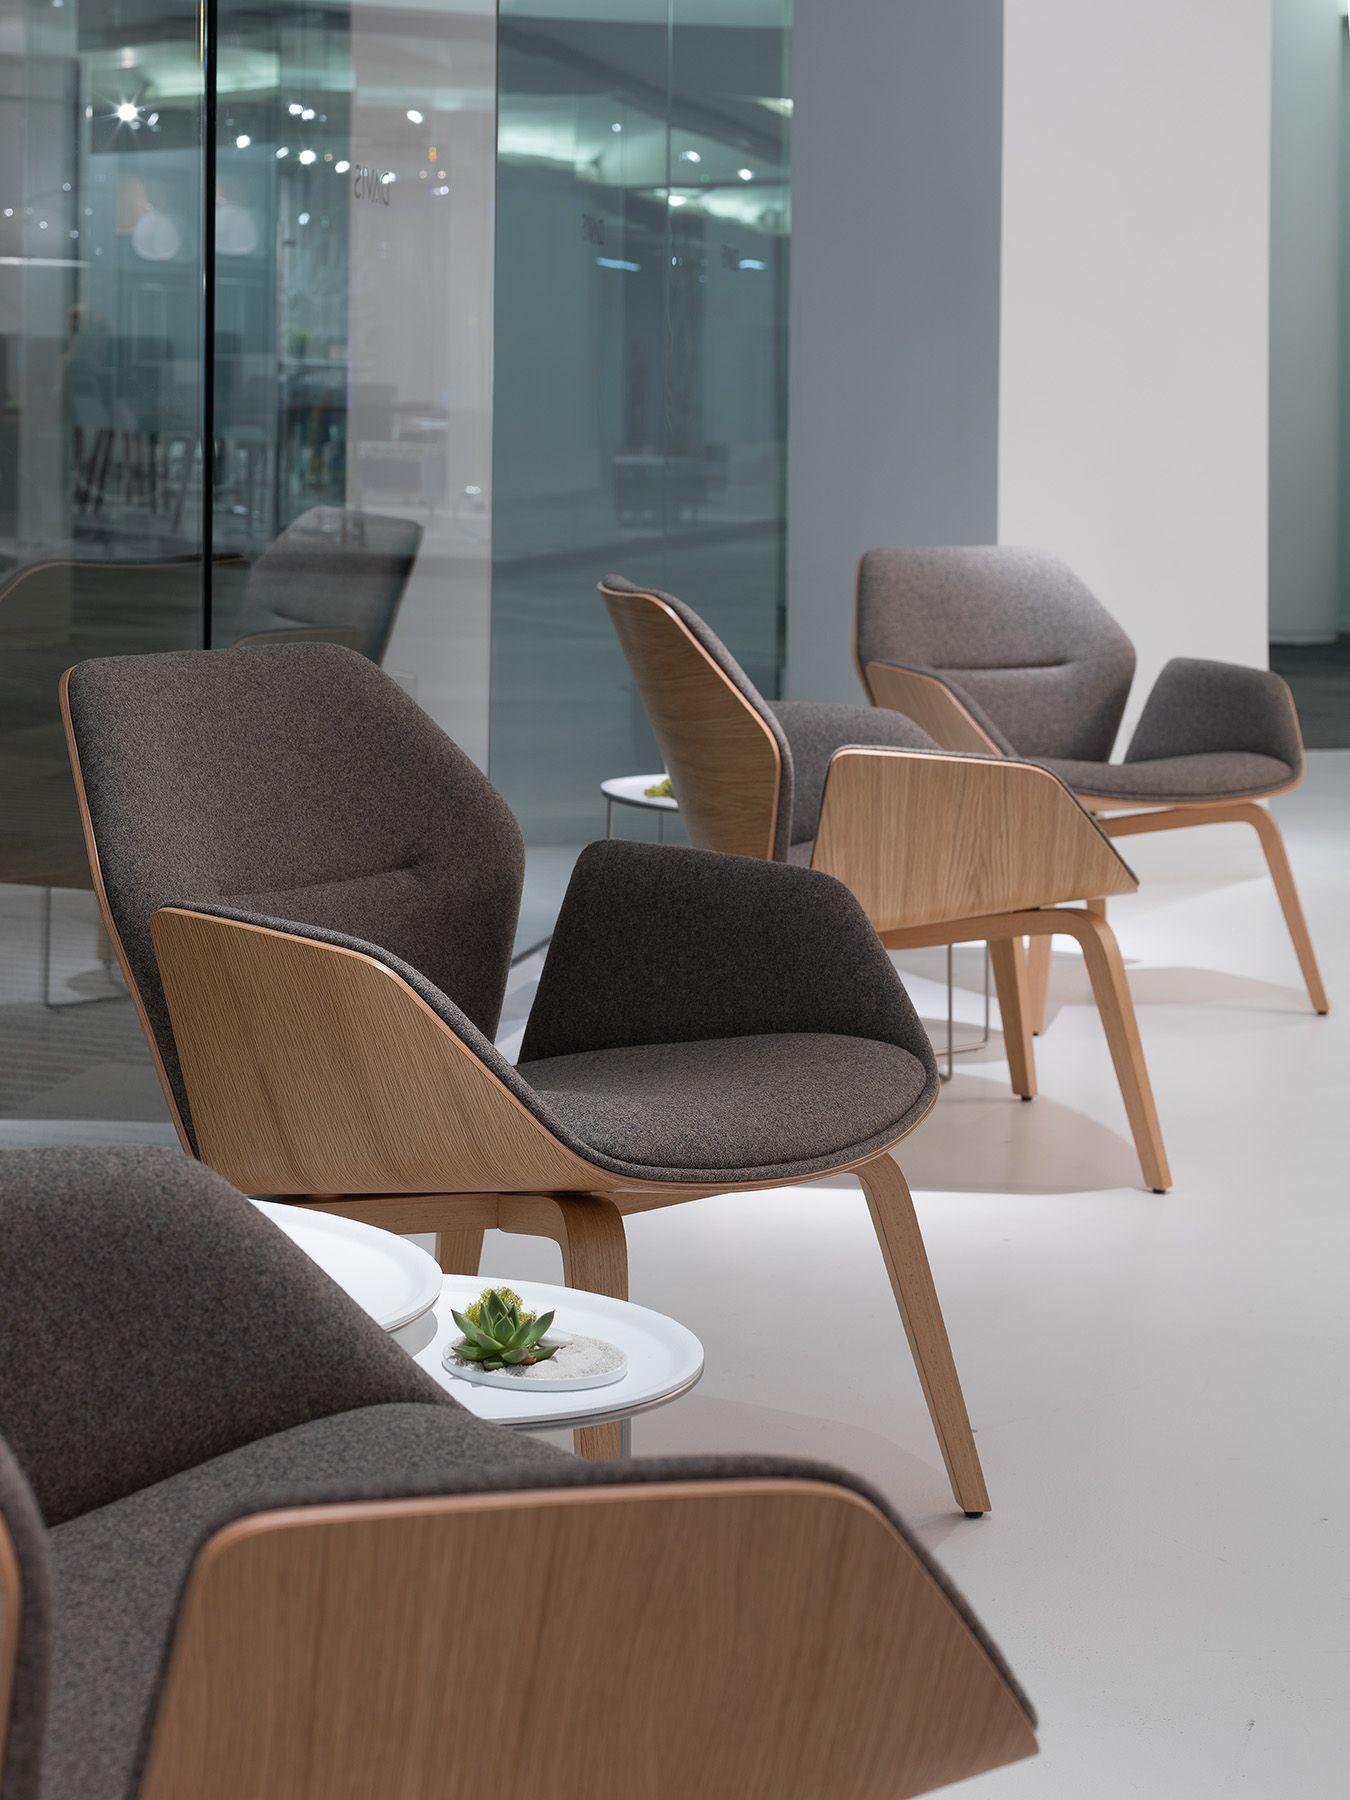 My Design Agenda is part of Davis furniture - Sponsored   Design News & Events Selection